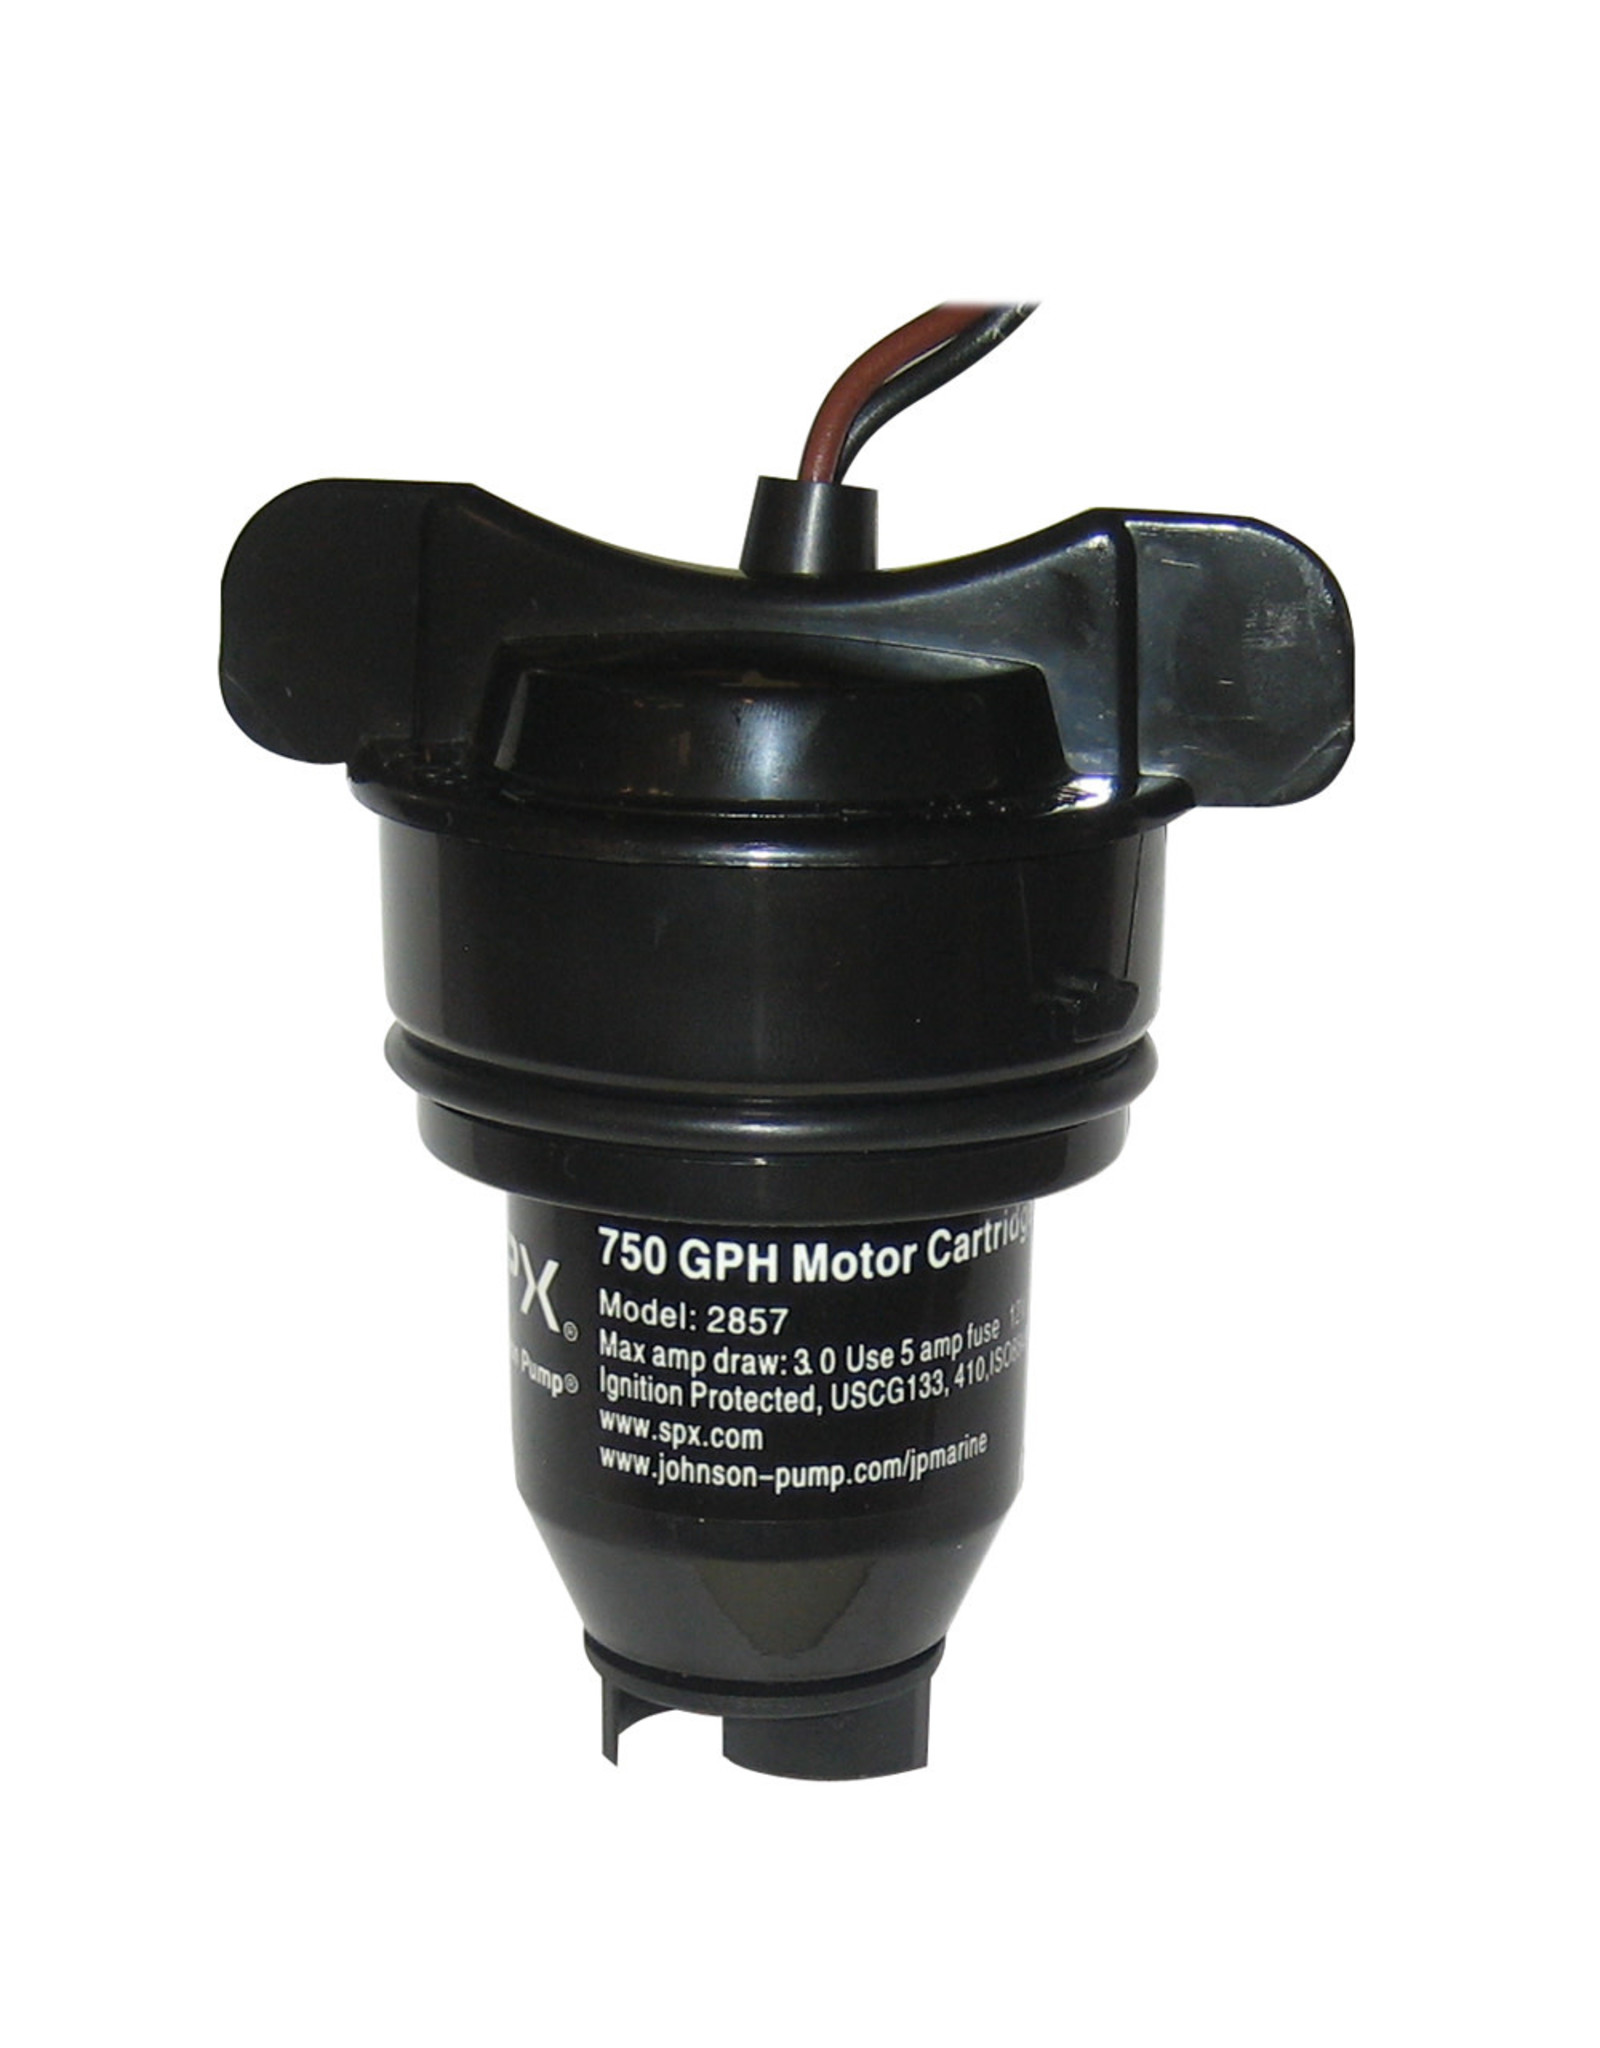 Johnson Johnson Pump 750 GPH Motor Cartridge Only